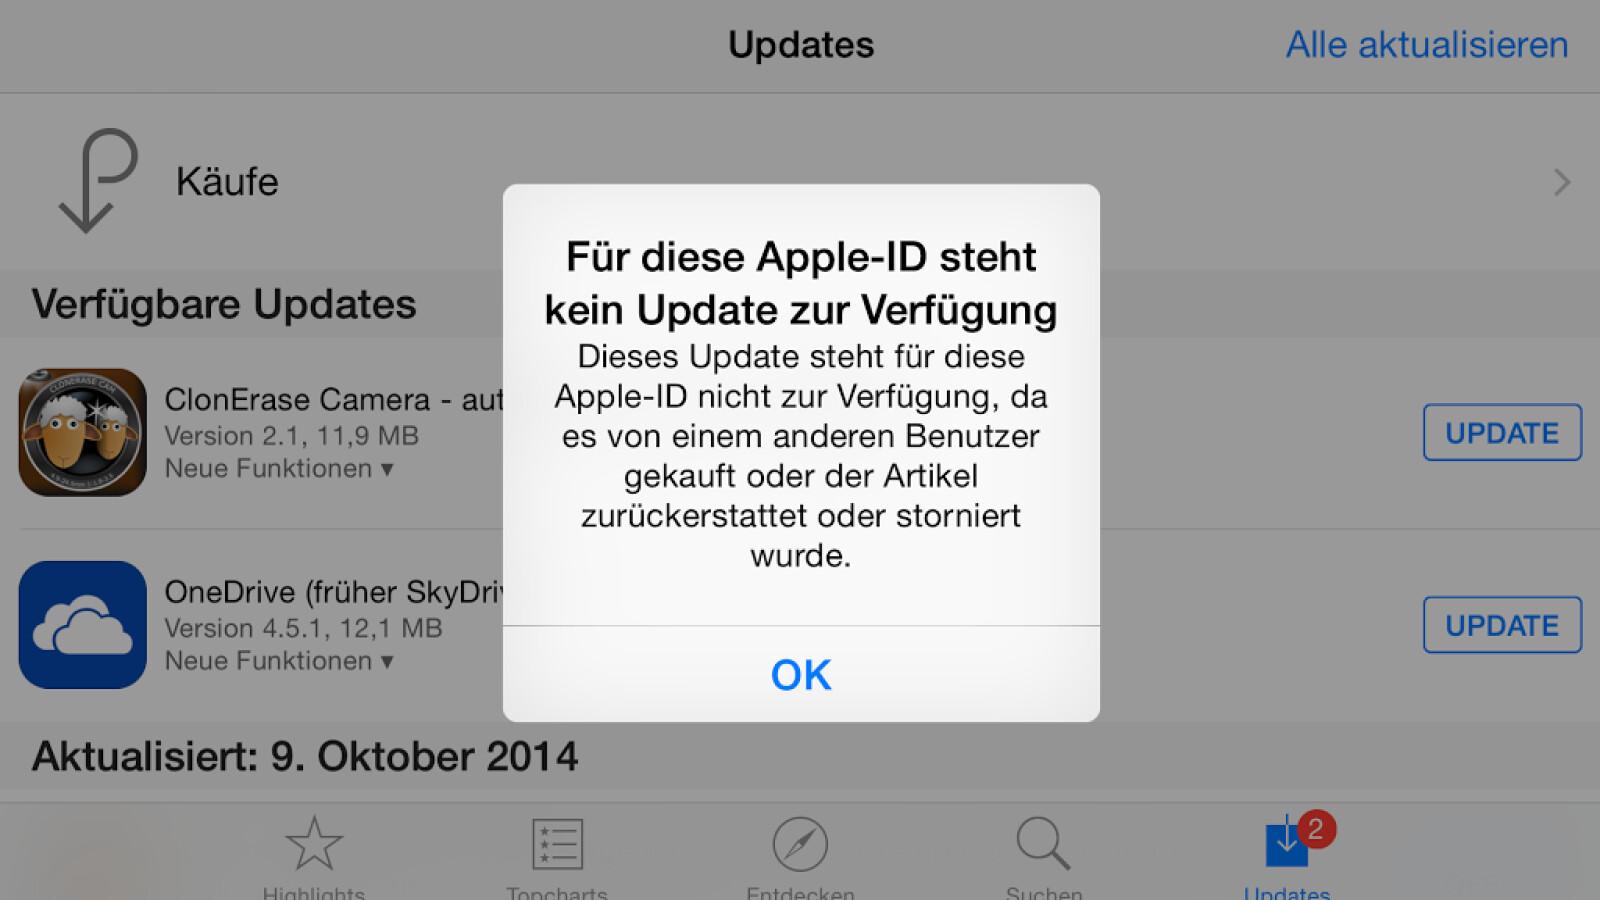 Charmant Lebenslauf Unterbrochen Download Mac App Store Galerie ...